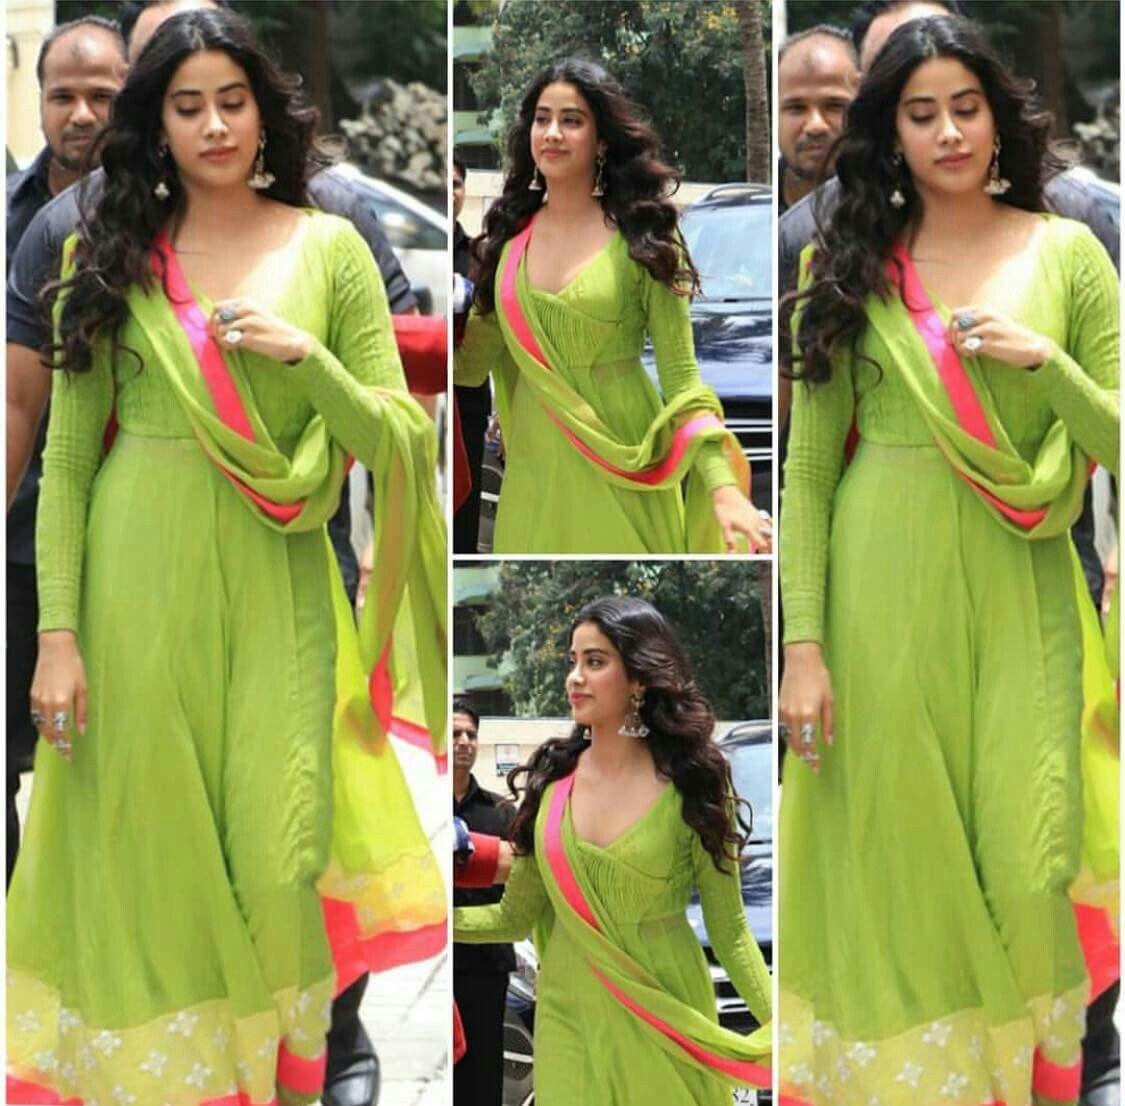 e8c63966ba Stunning Jhanvi kapoor at her movie Dhadak trailer launch | It's ...